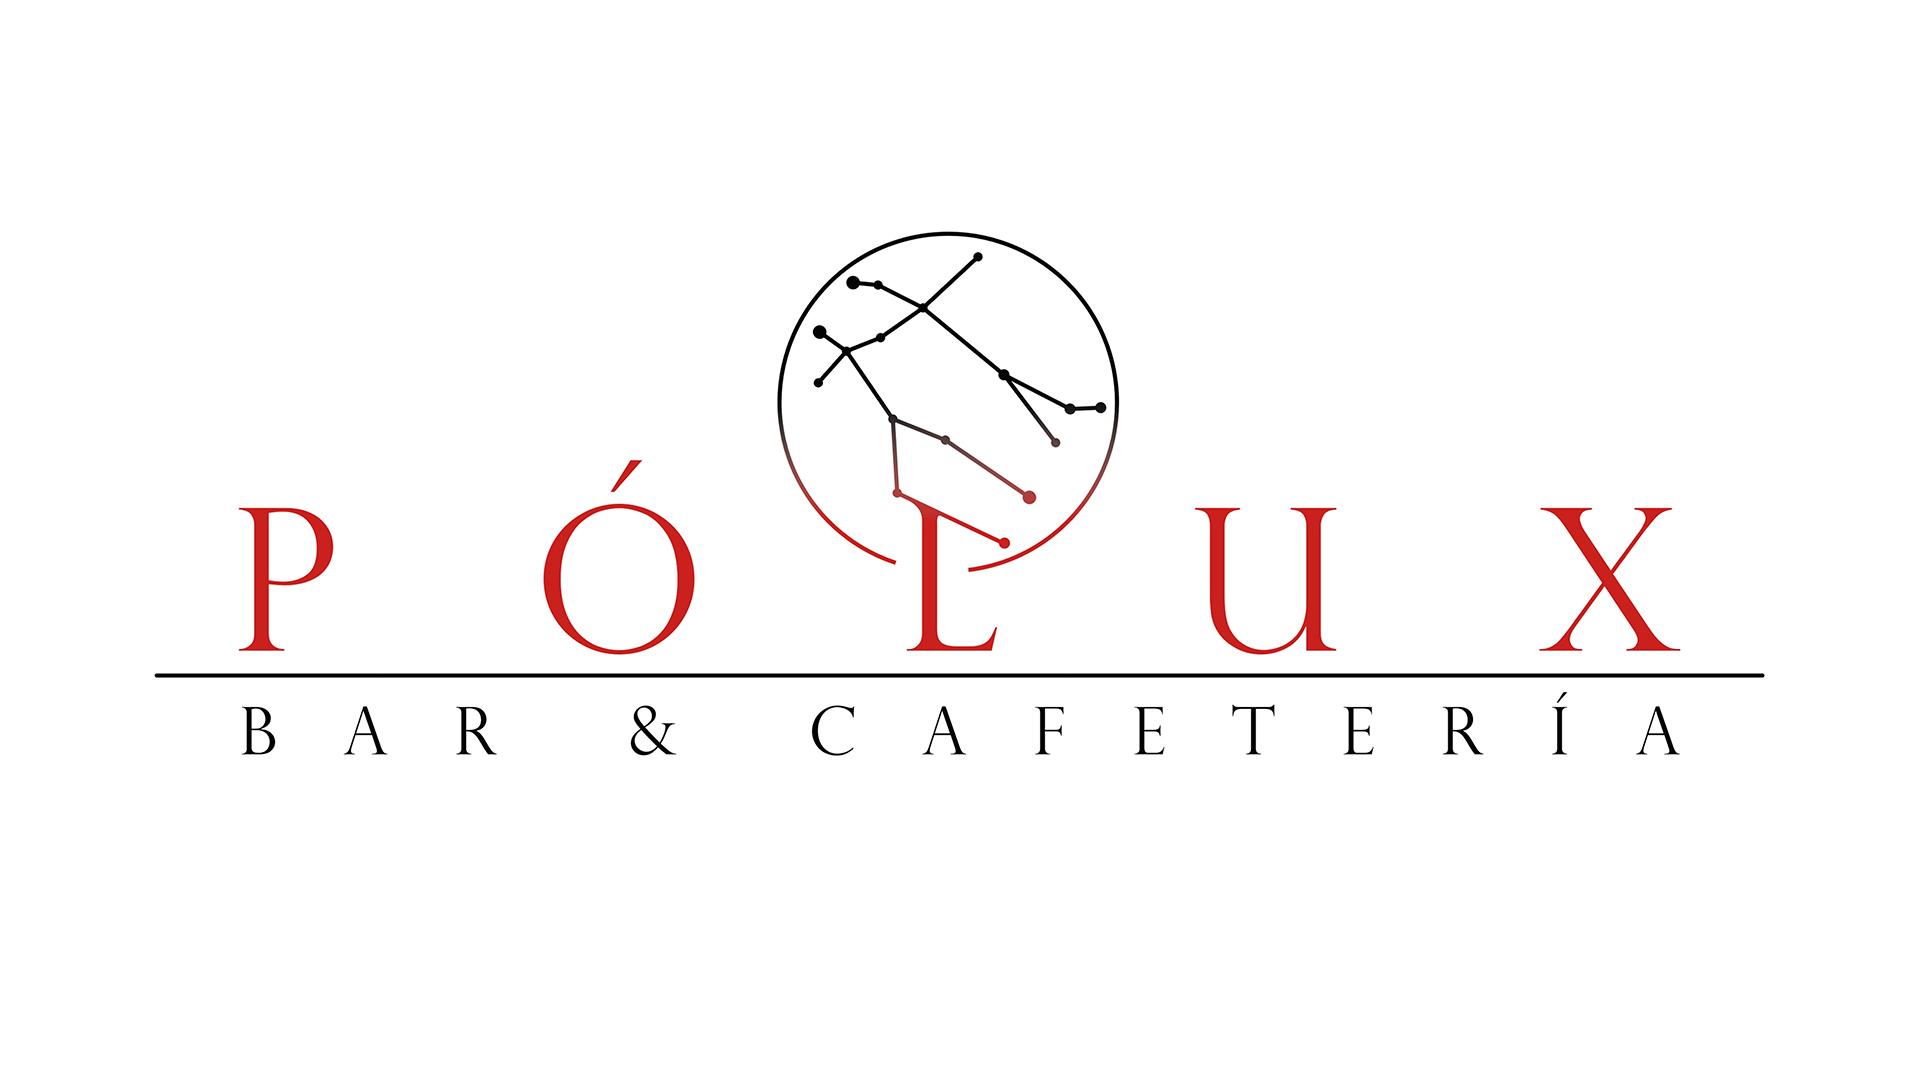 Bar Cafetería Pólux